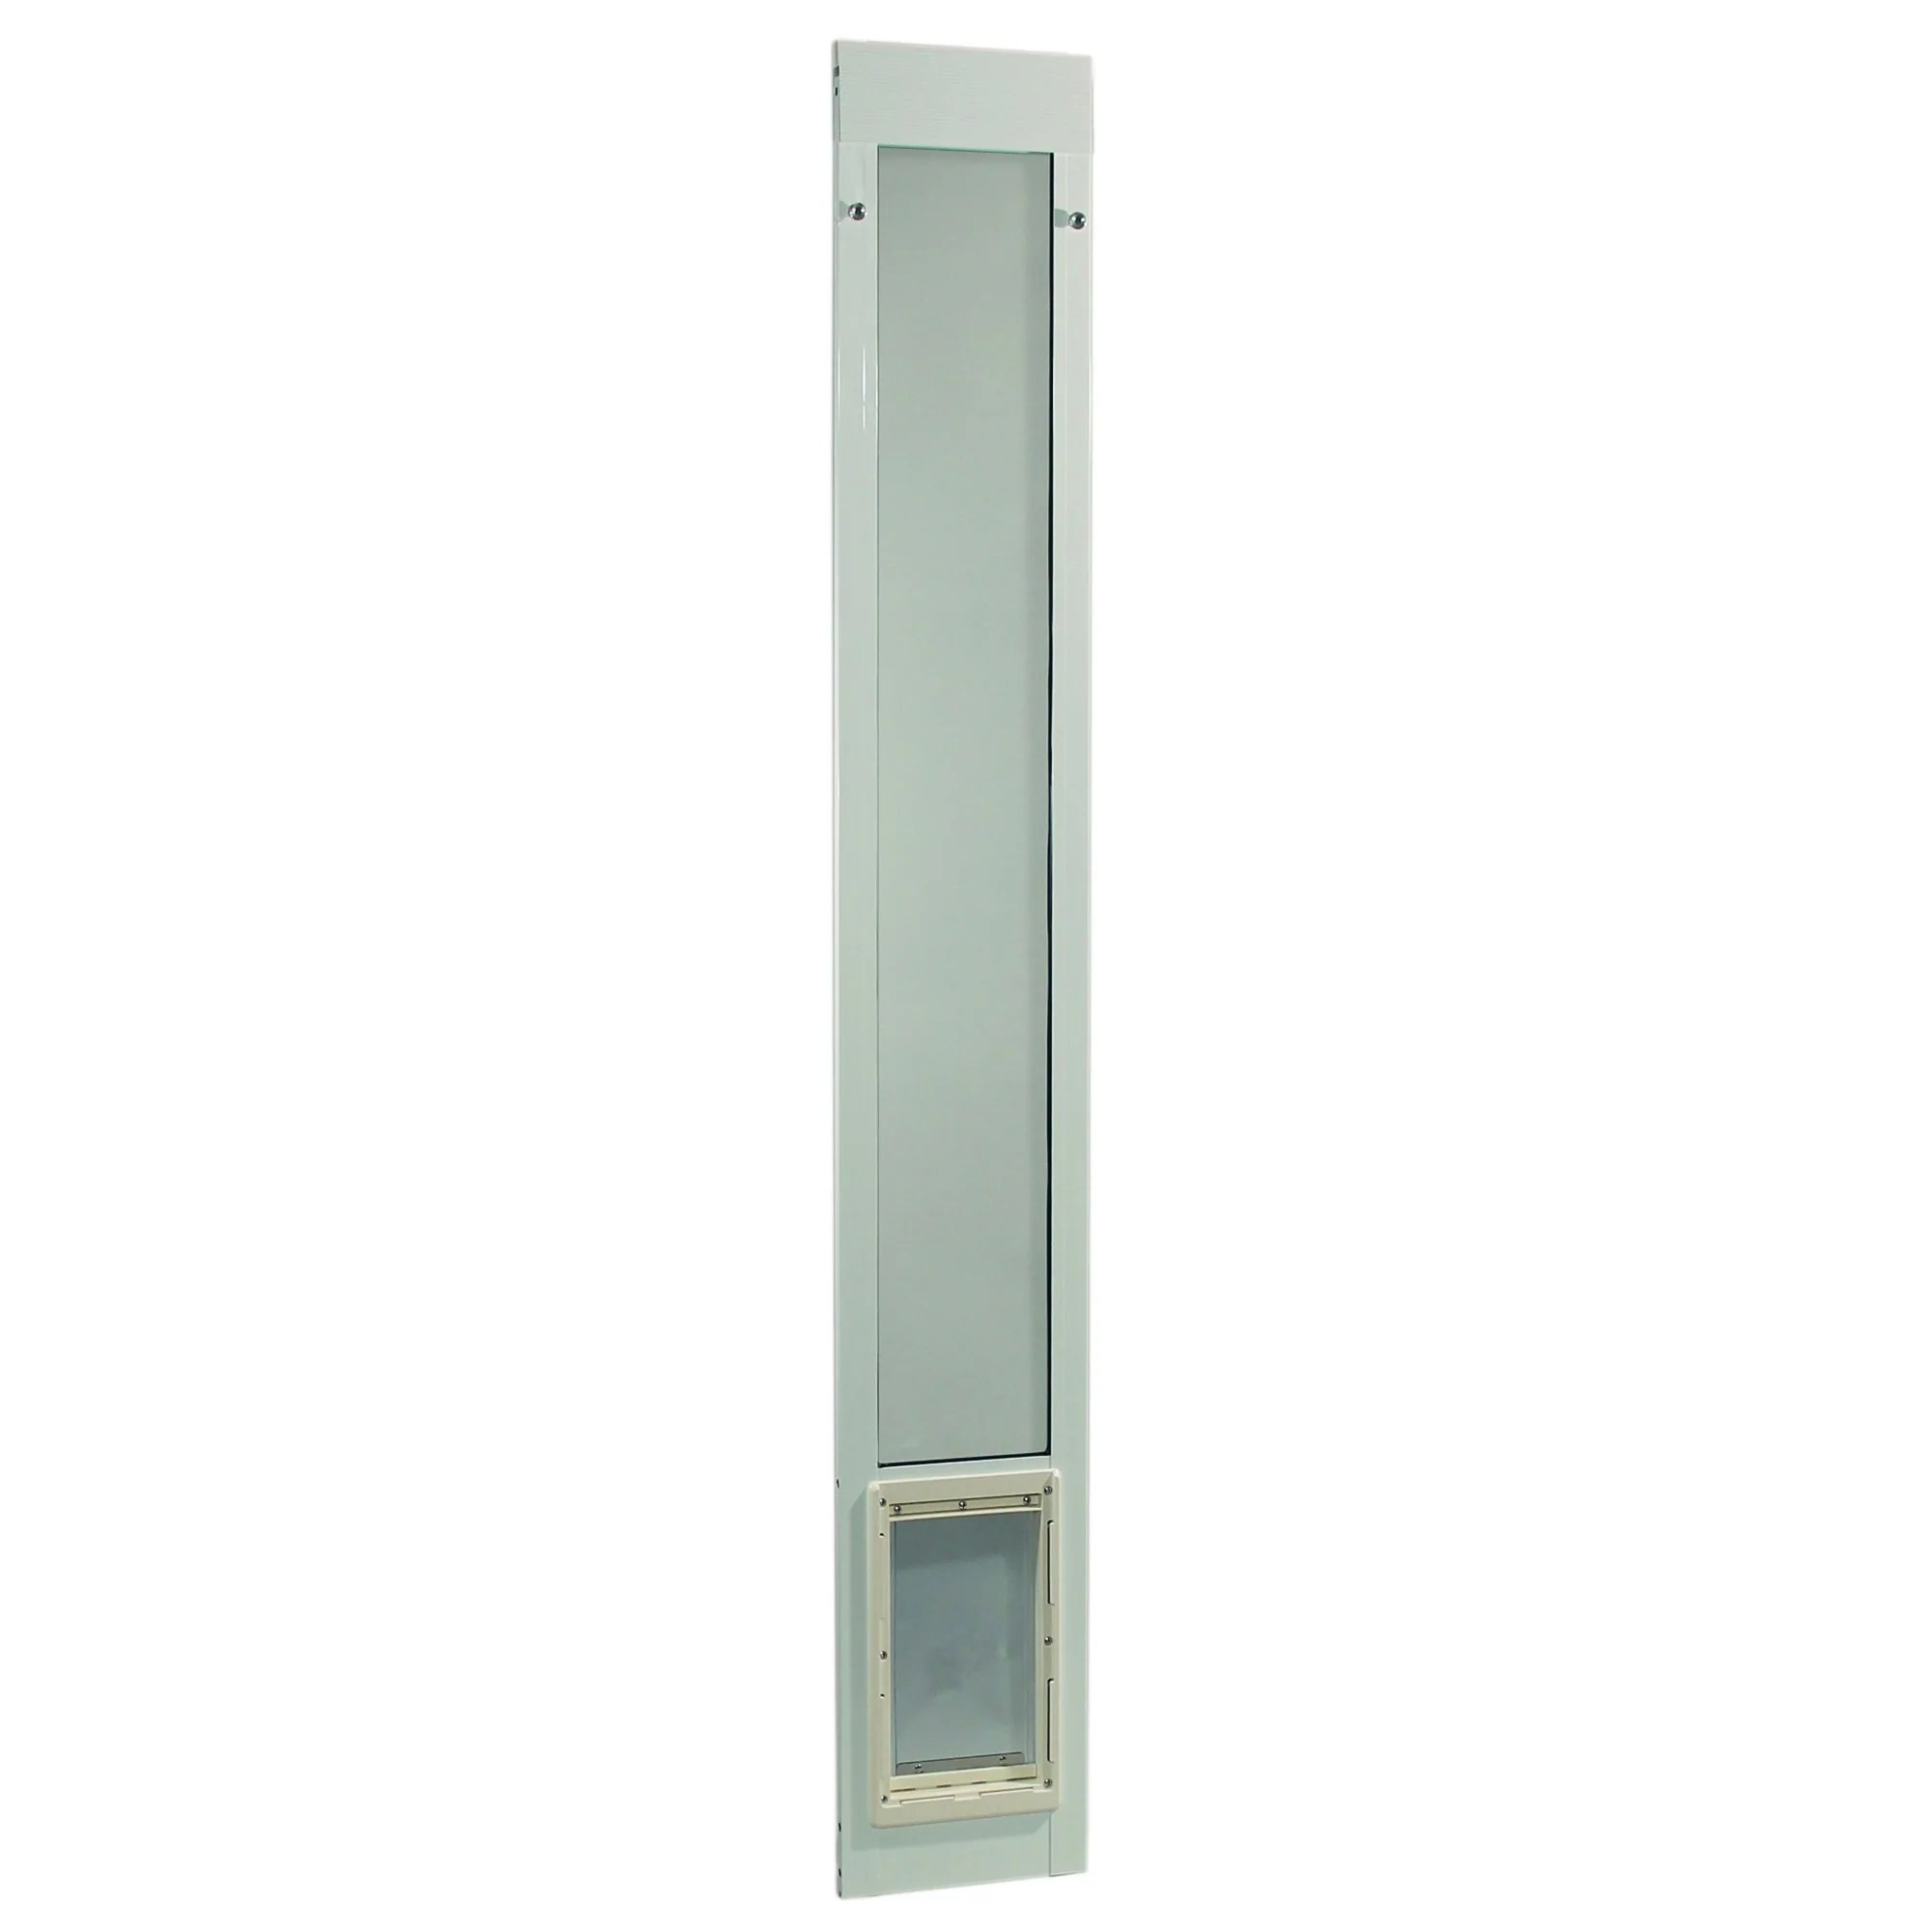 ideal pet products fast fit aluminum patio sliding pet door